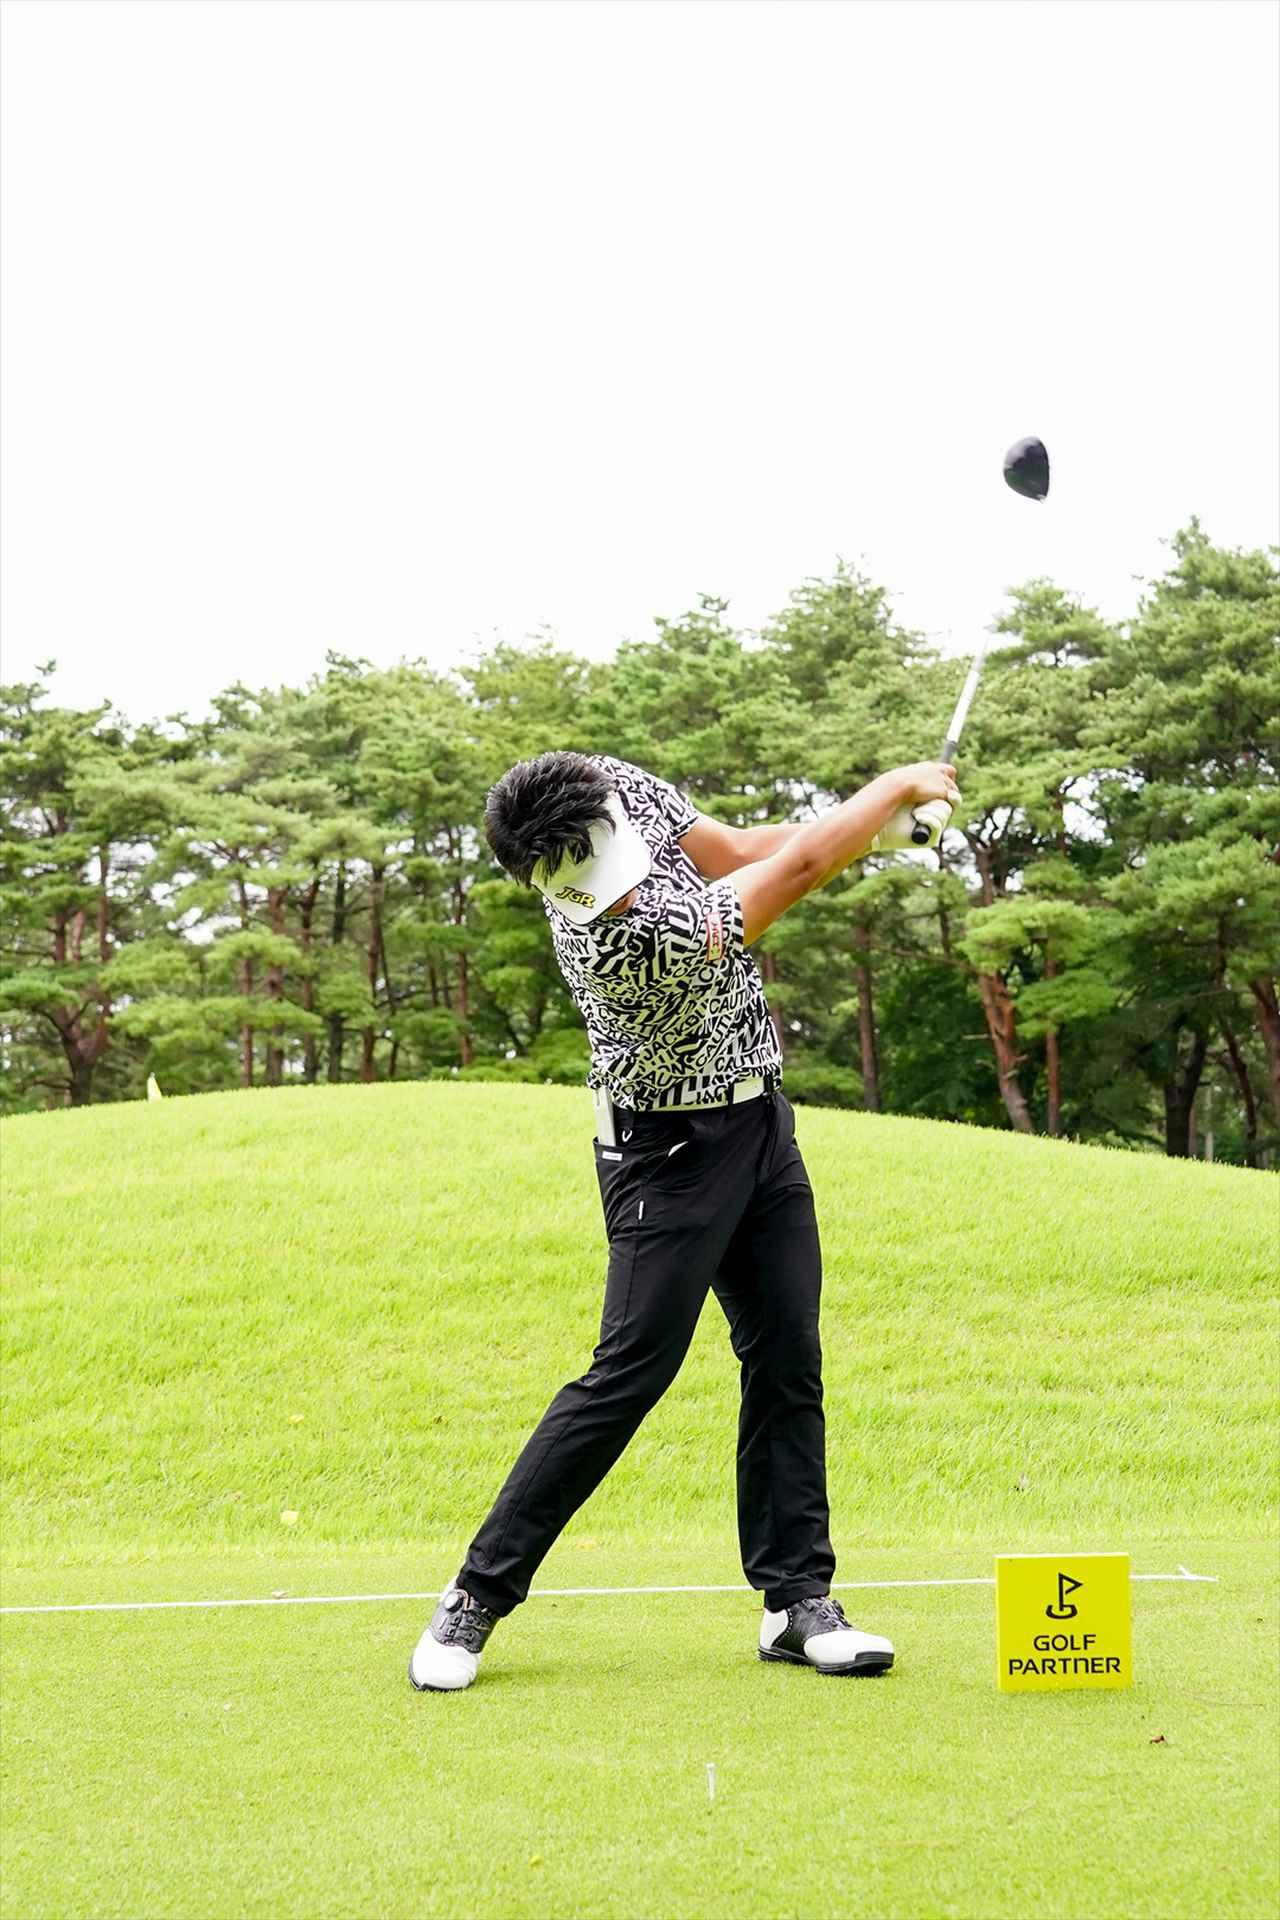 Images : 10番目の画像 - 関藤直煕 ドライバー正面連続写真 - みんなのゴルフダイジェスト